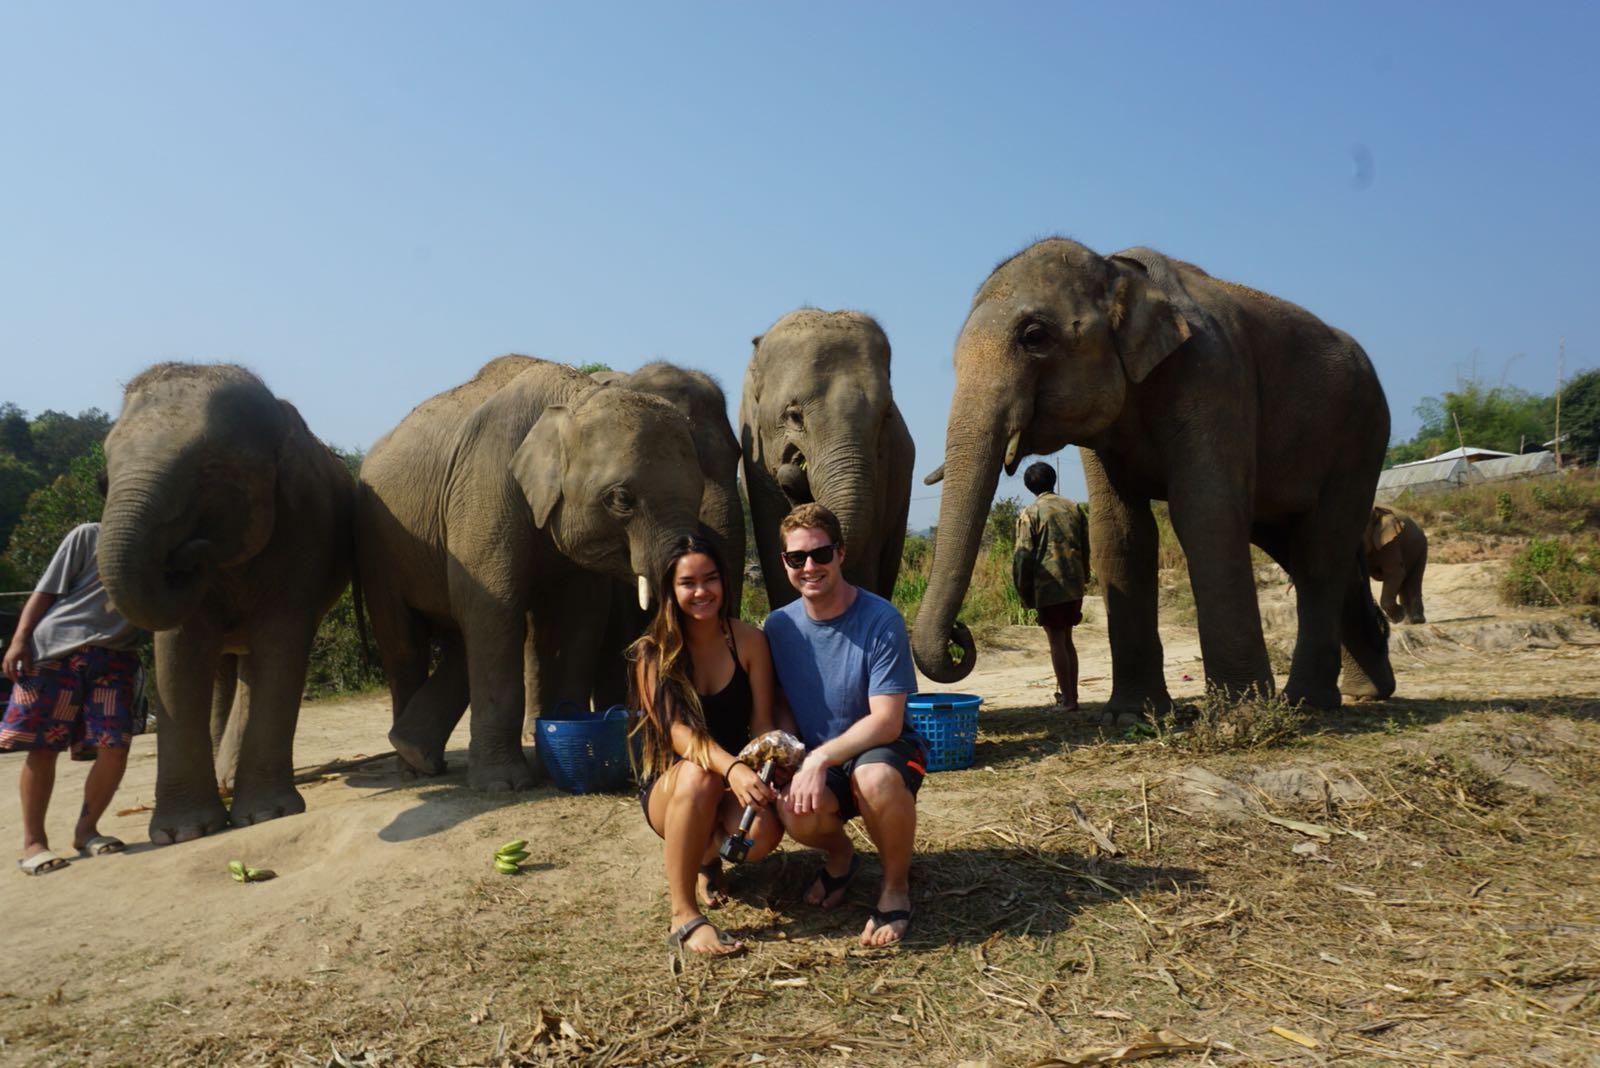 The Elephants 😍